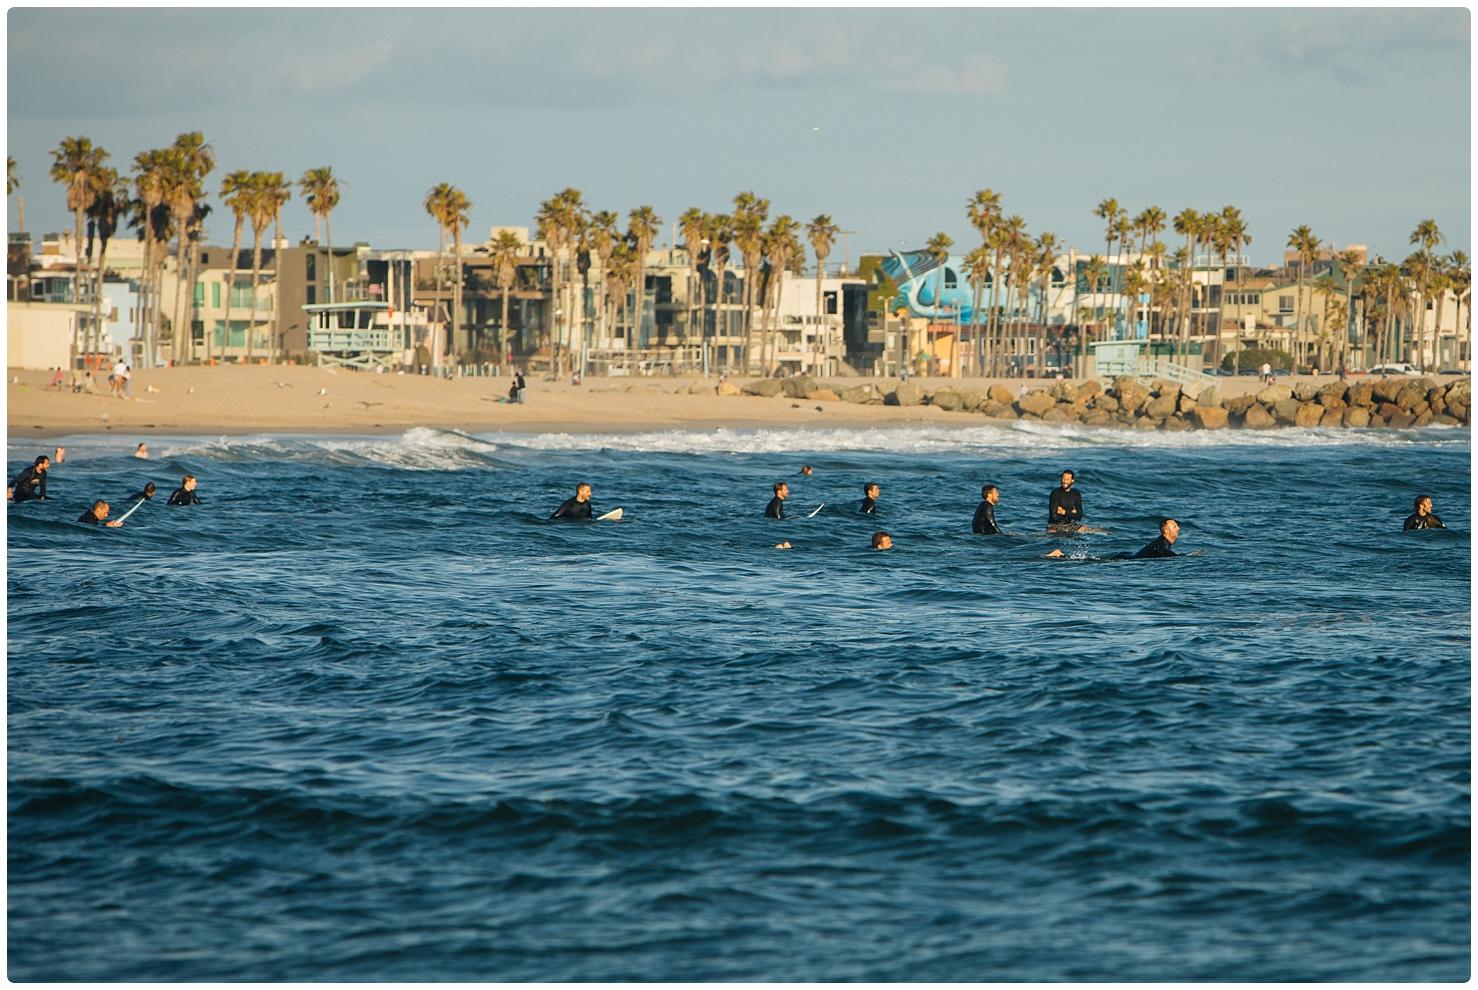 Beach,California,Venice,Venice Beach,haylo photo,haylo photography,northern virginia photographer,surf,surfers,